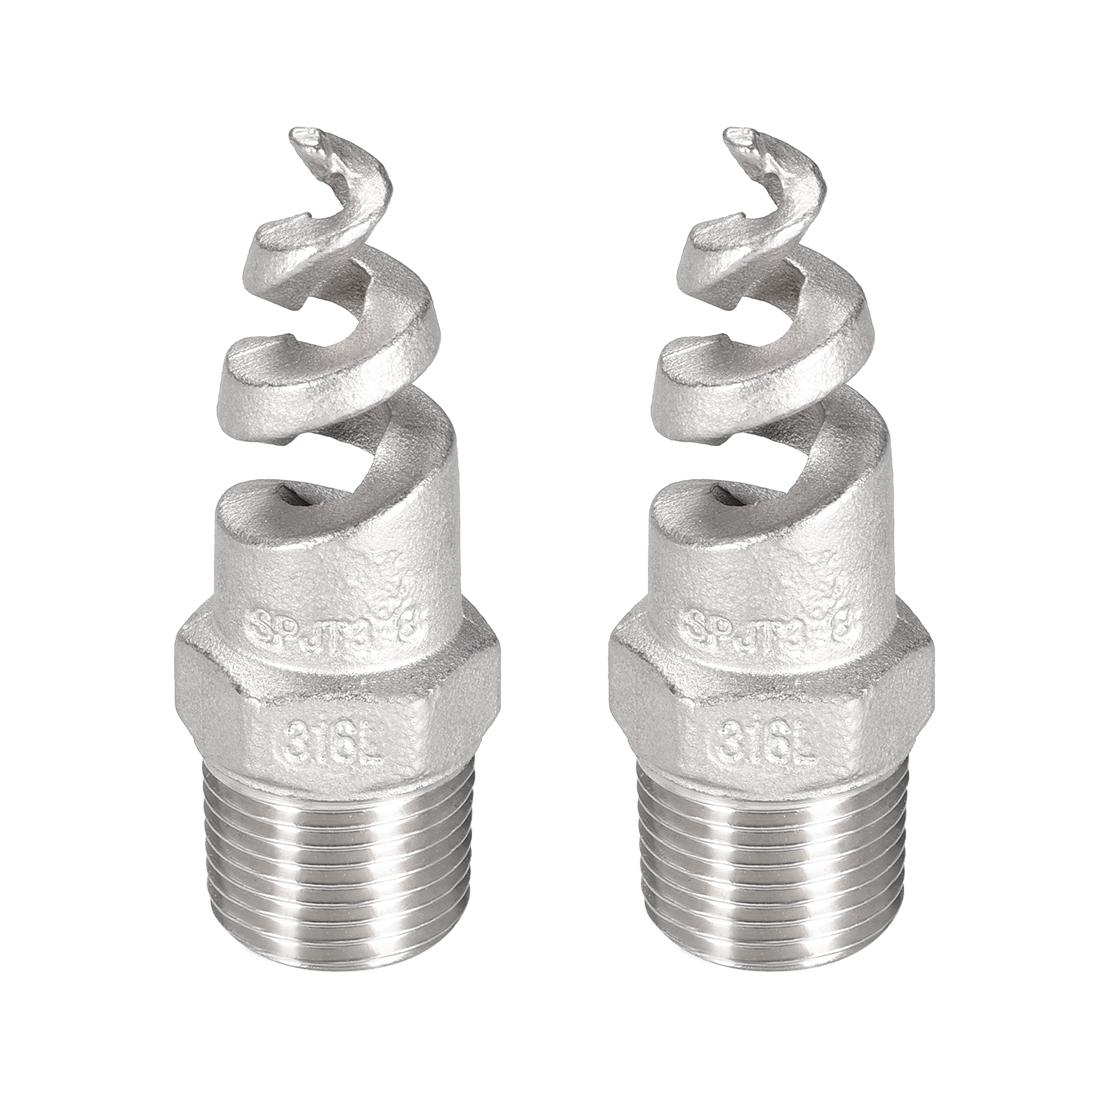 Spiral Nozzle, 3/8BSPT 316 Stainless Steel Mist Sprinkler, 2 Pcs (Silver Tone)